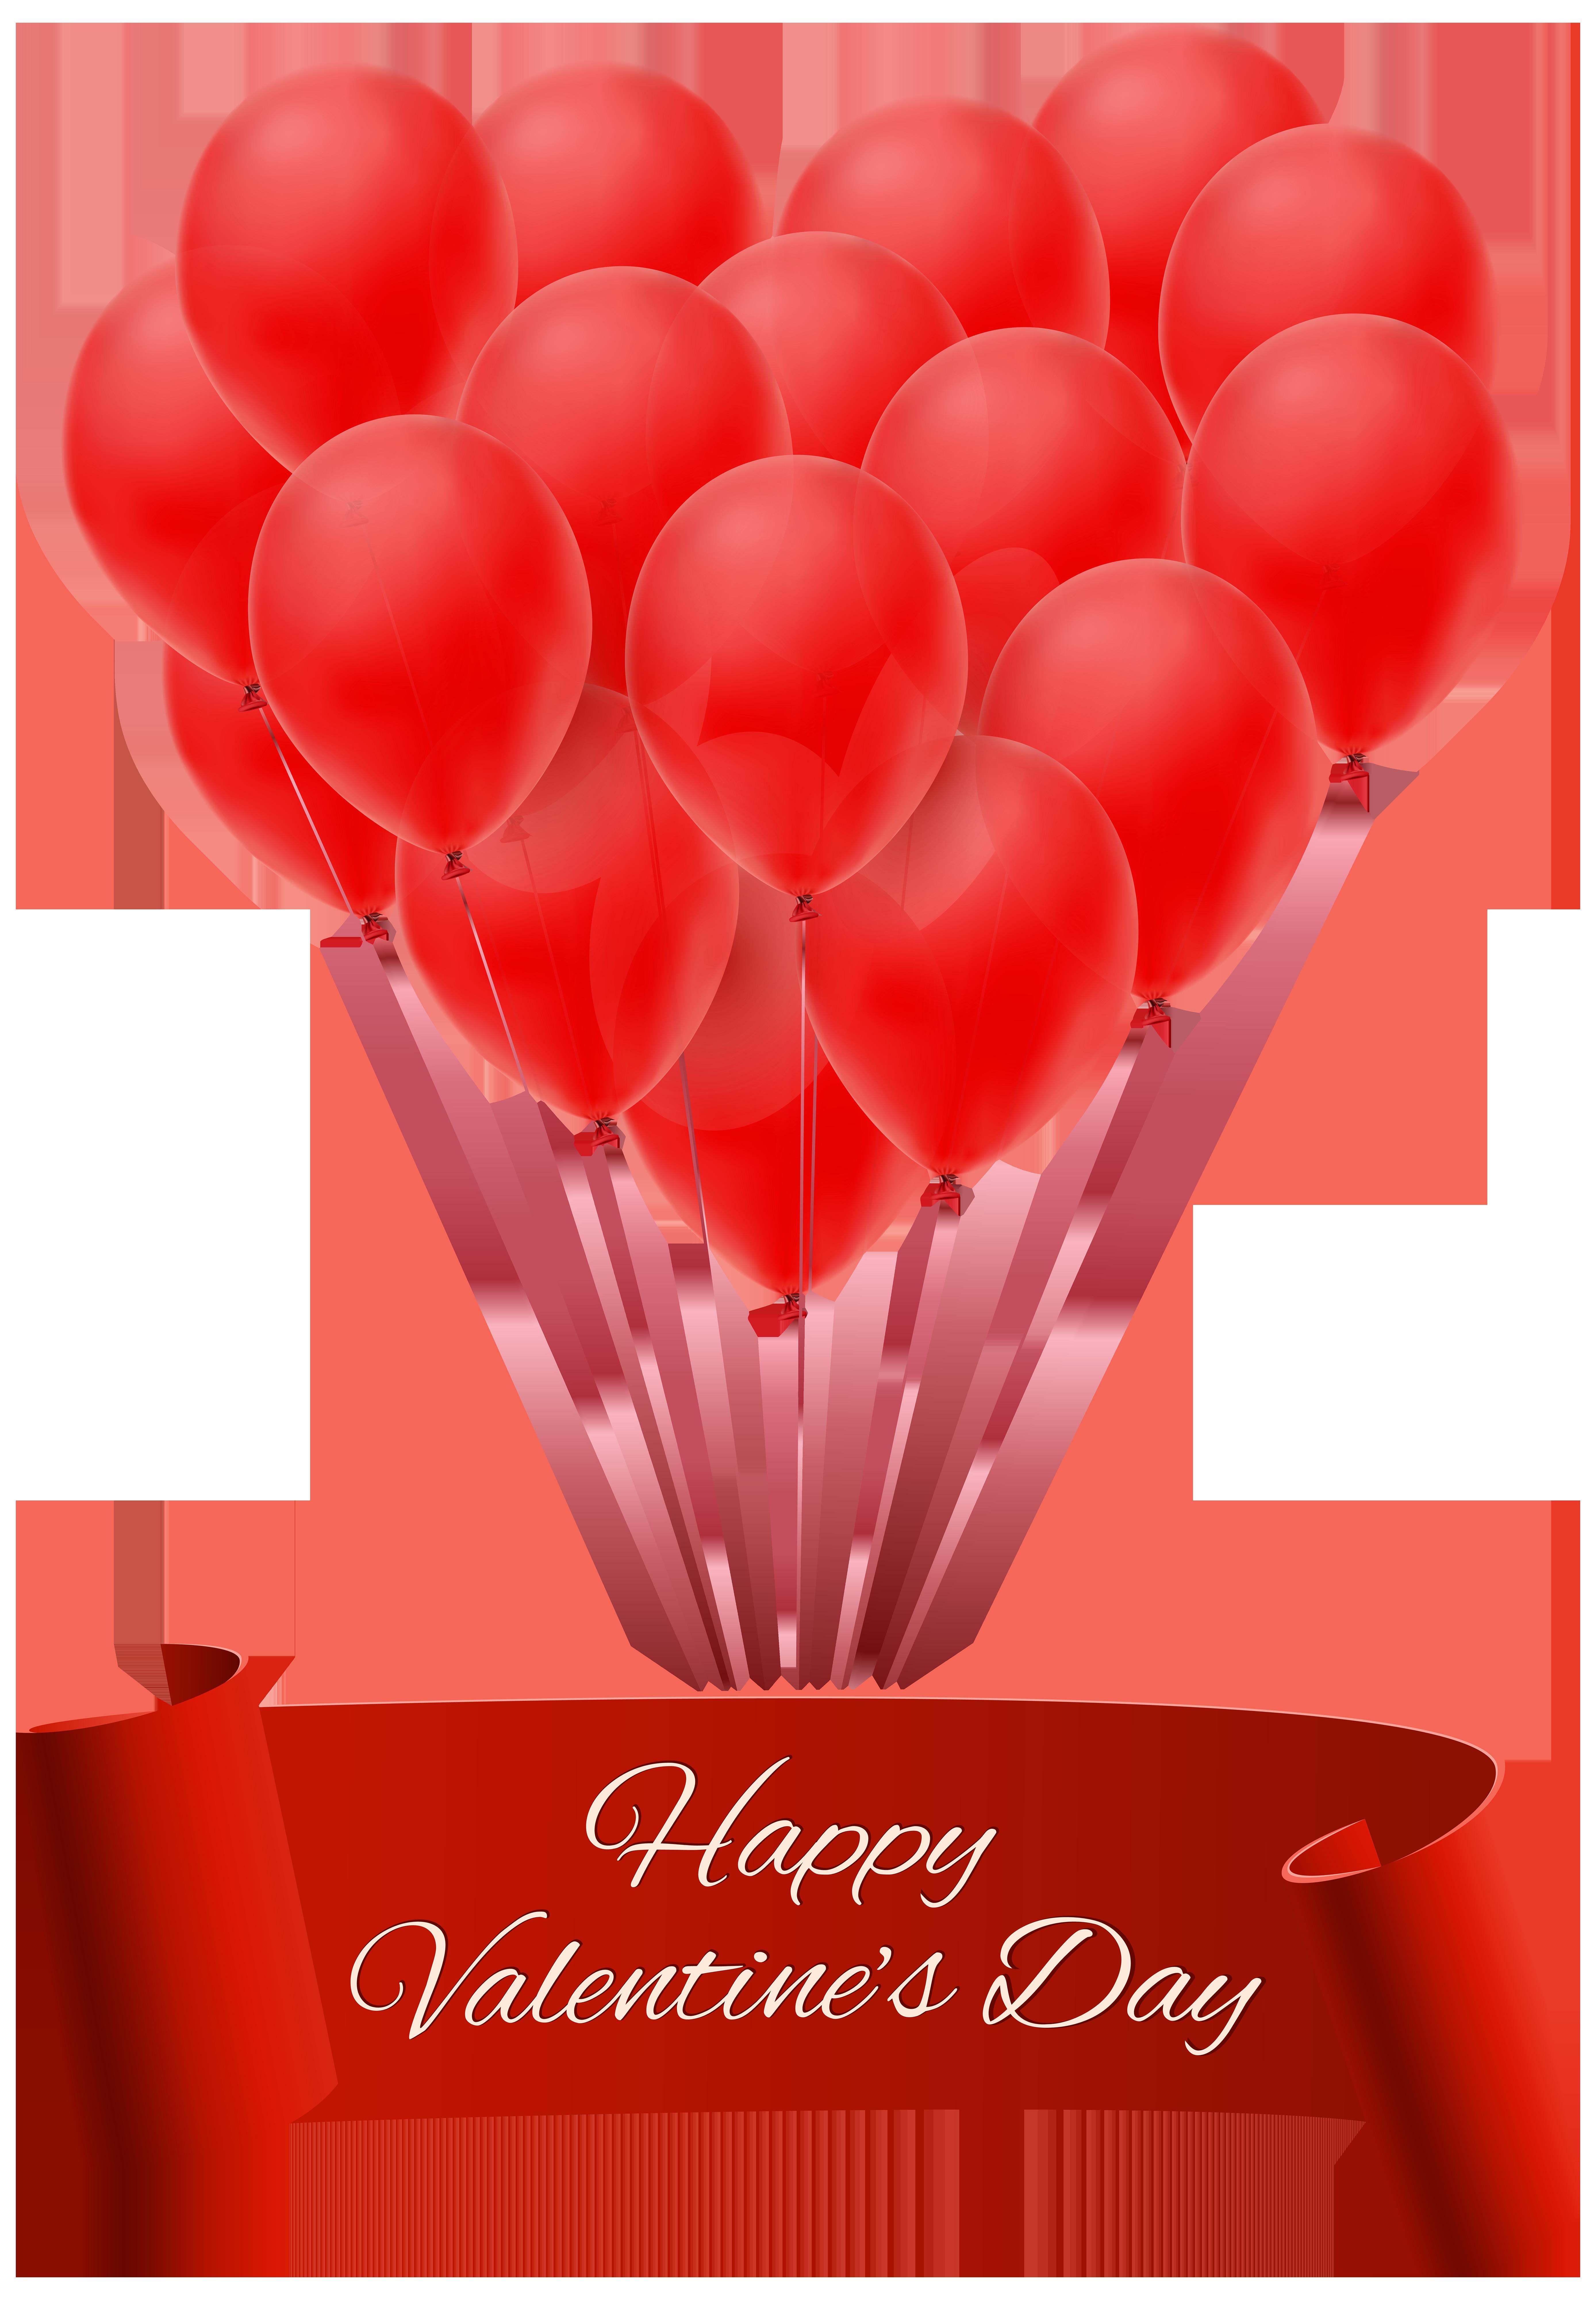 Clipart balloons cartoon. Happy valentine s day